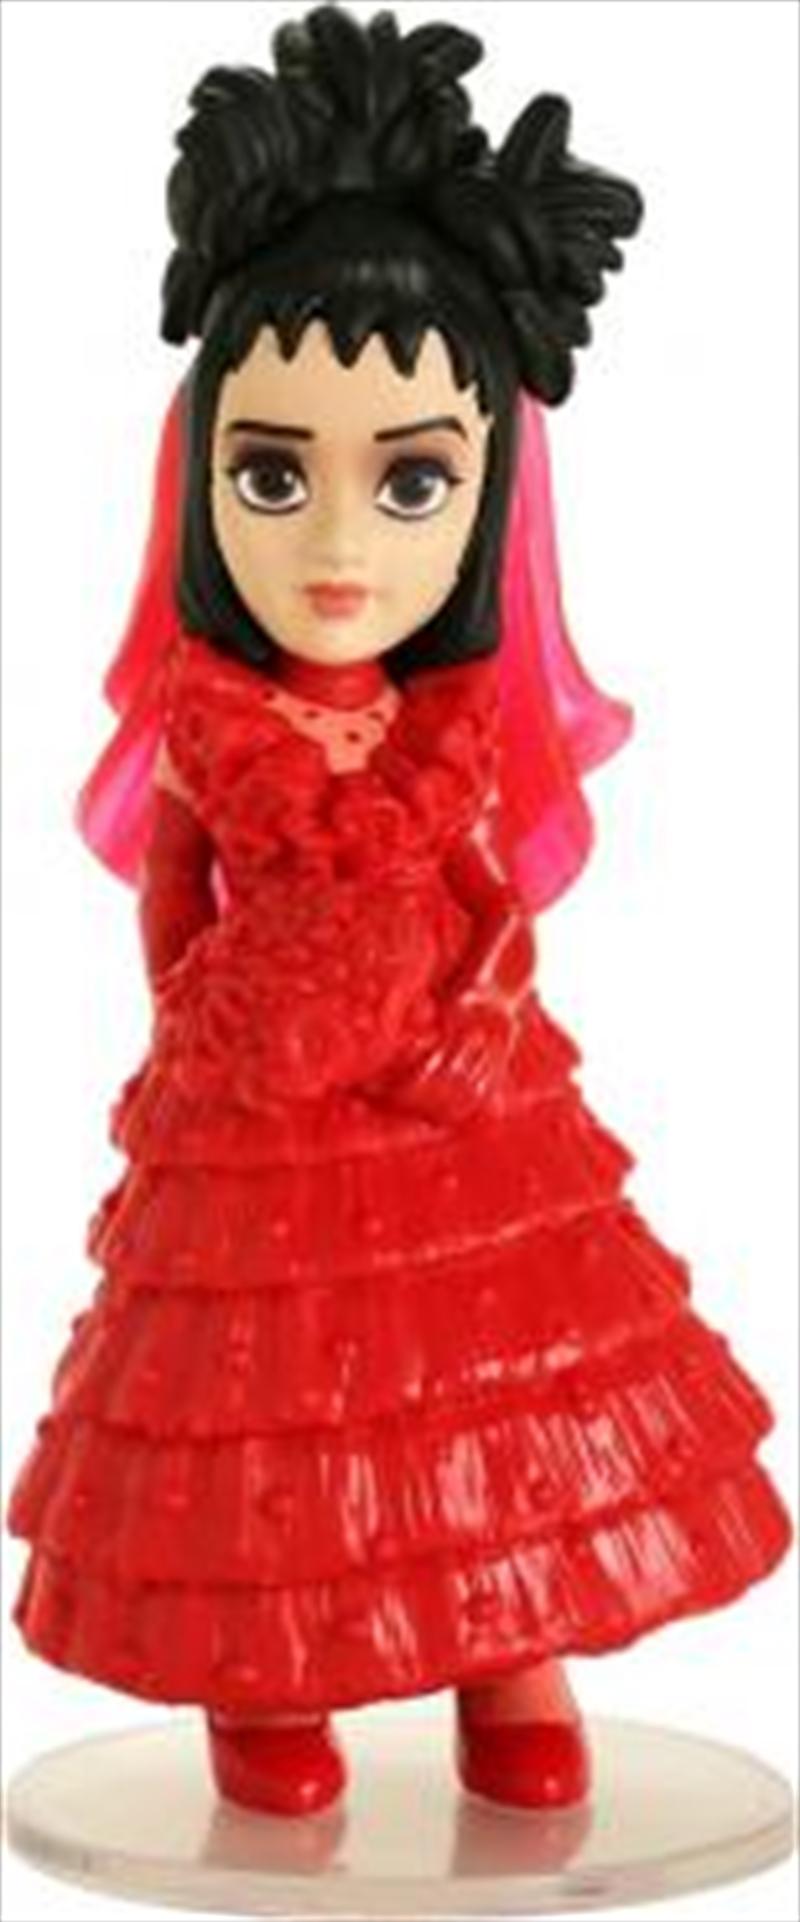 Beetlejuice - Lydia Deetz (Red Wedding Dress) Rock Candy | Merchandise